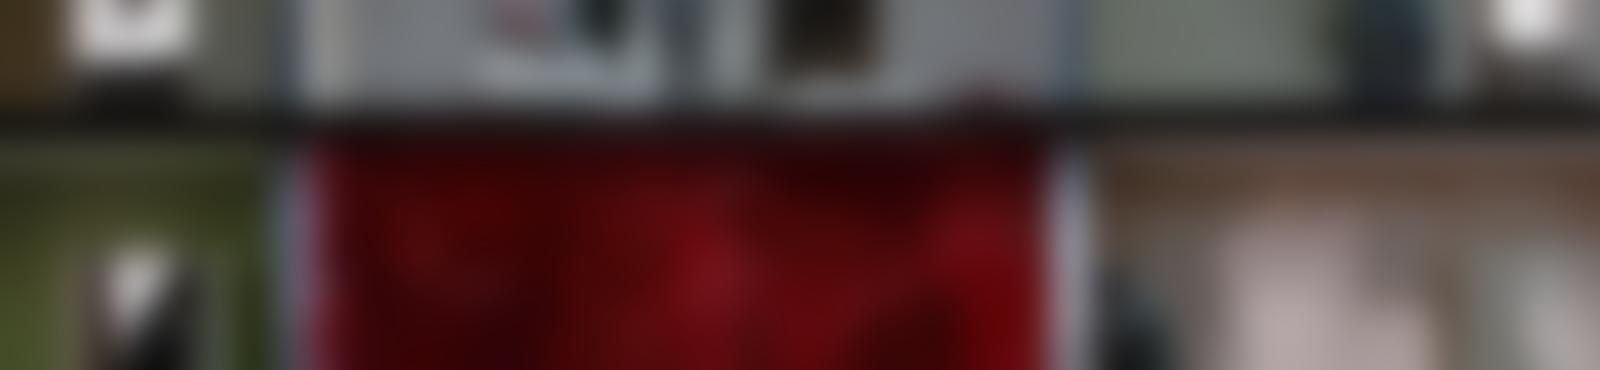 Blurred b9dd720b 9518 4efa 8f14 d5ccb99017b9